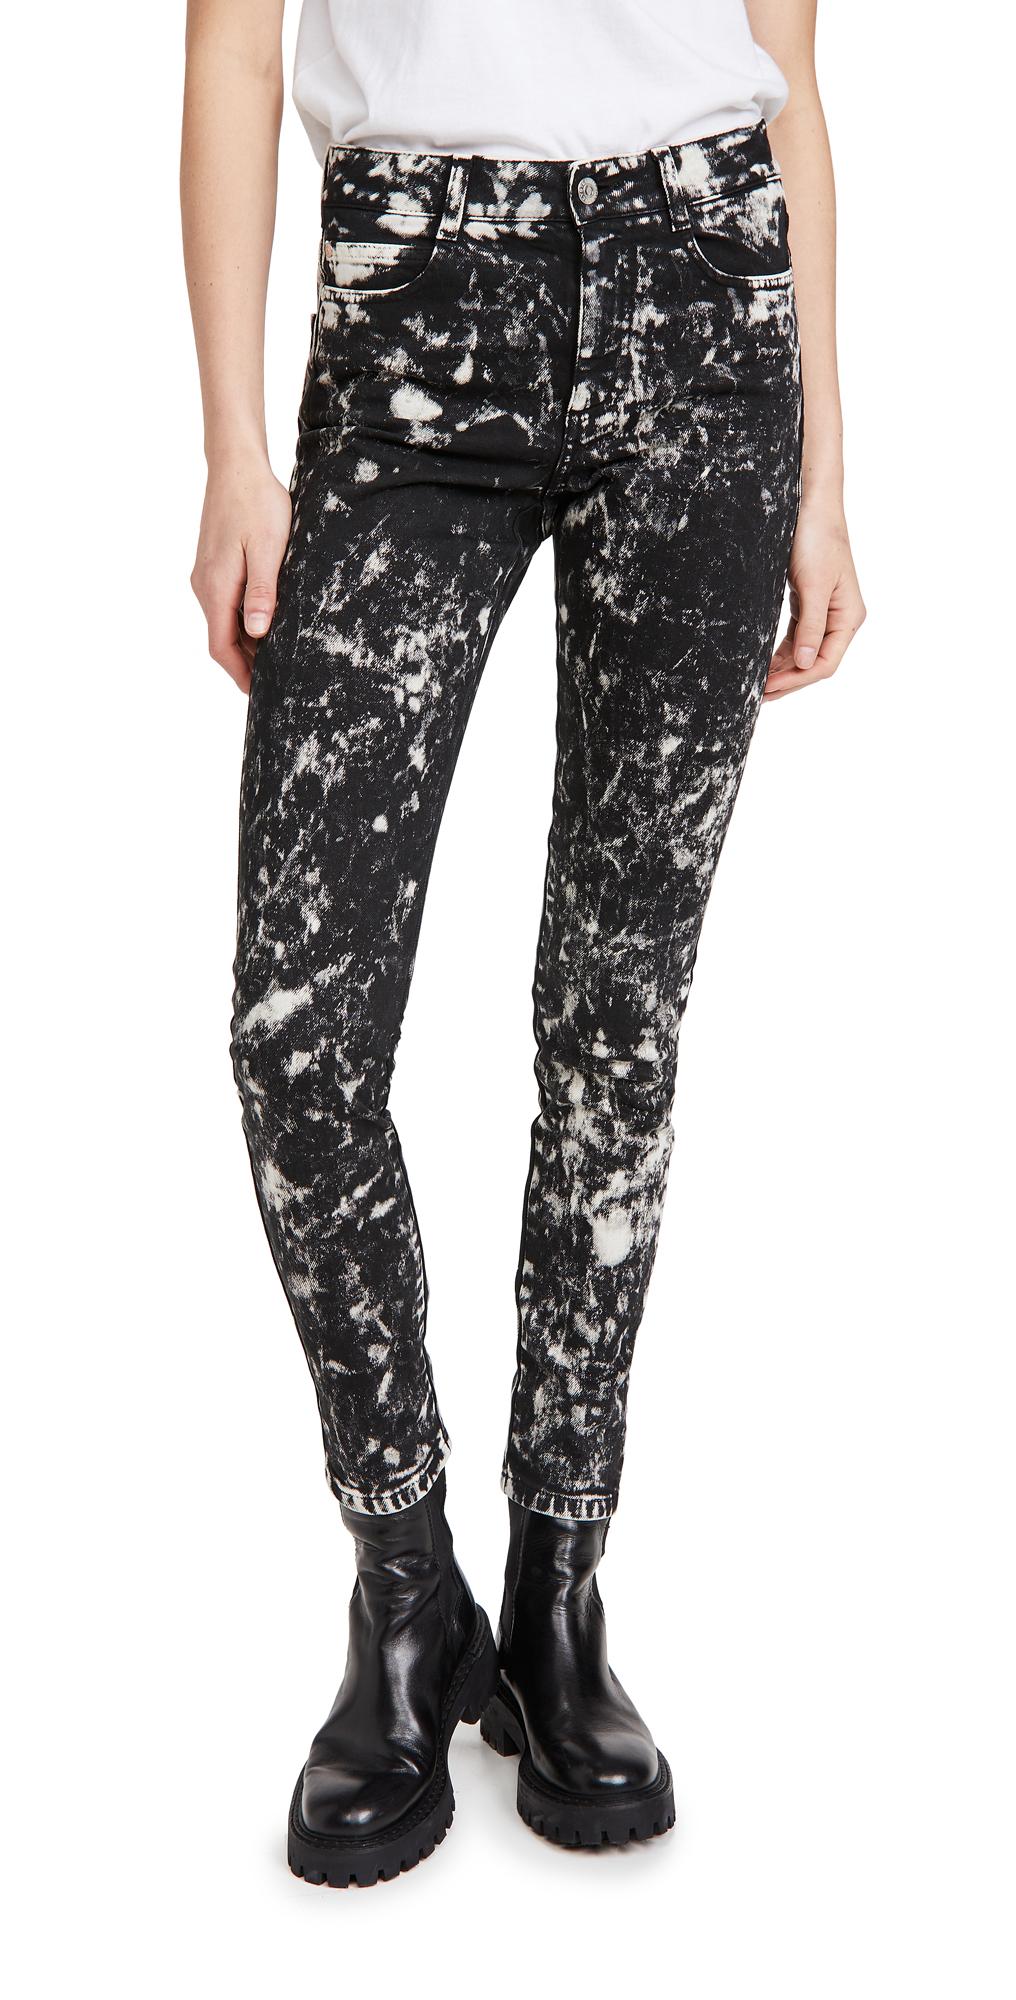 Stella McCartney High Rise Skinny Inside Out Black Galaxy Jeans